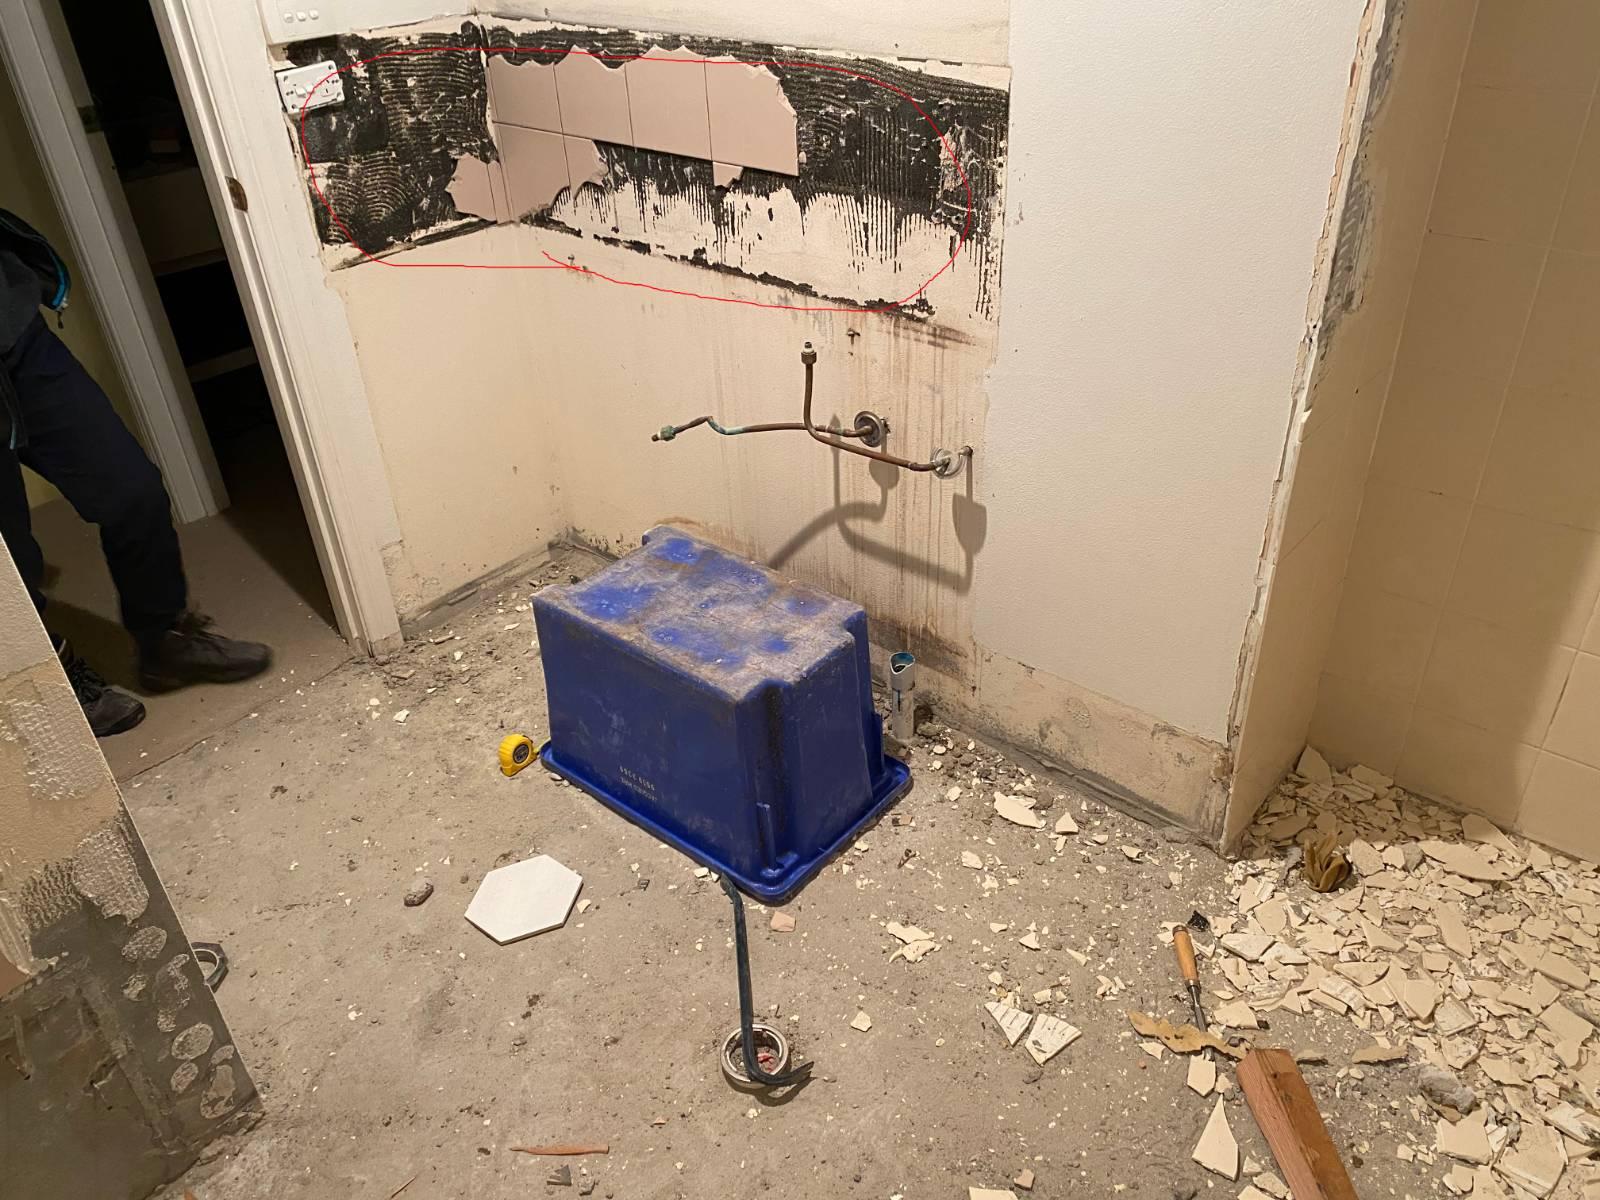 Textualise bathroom wall